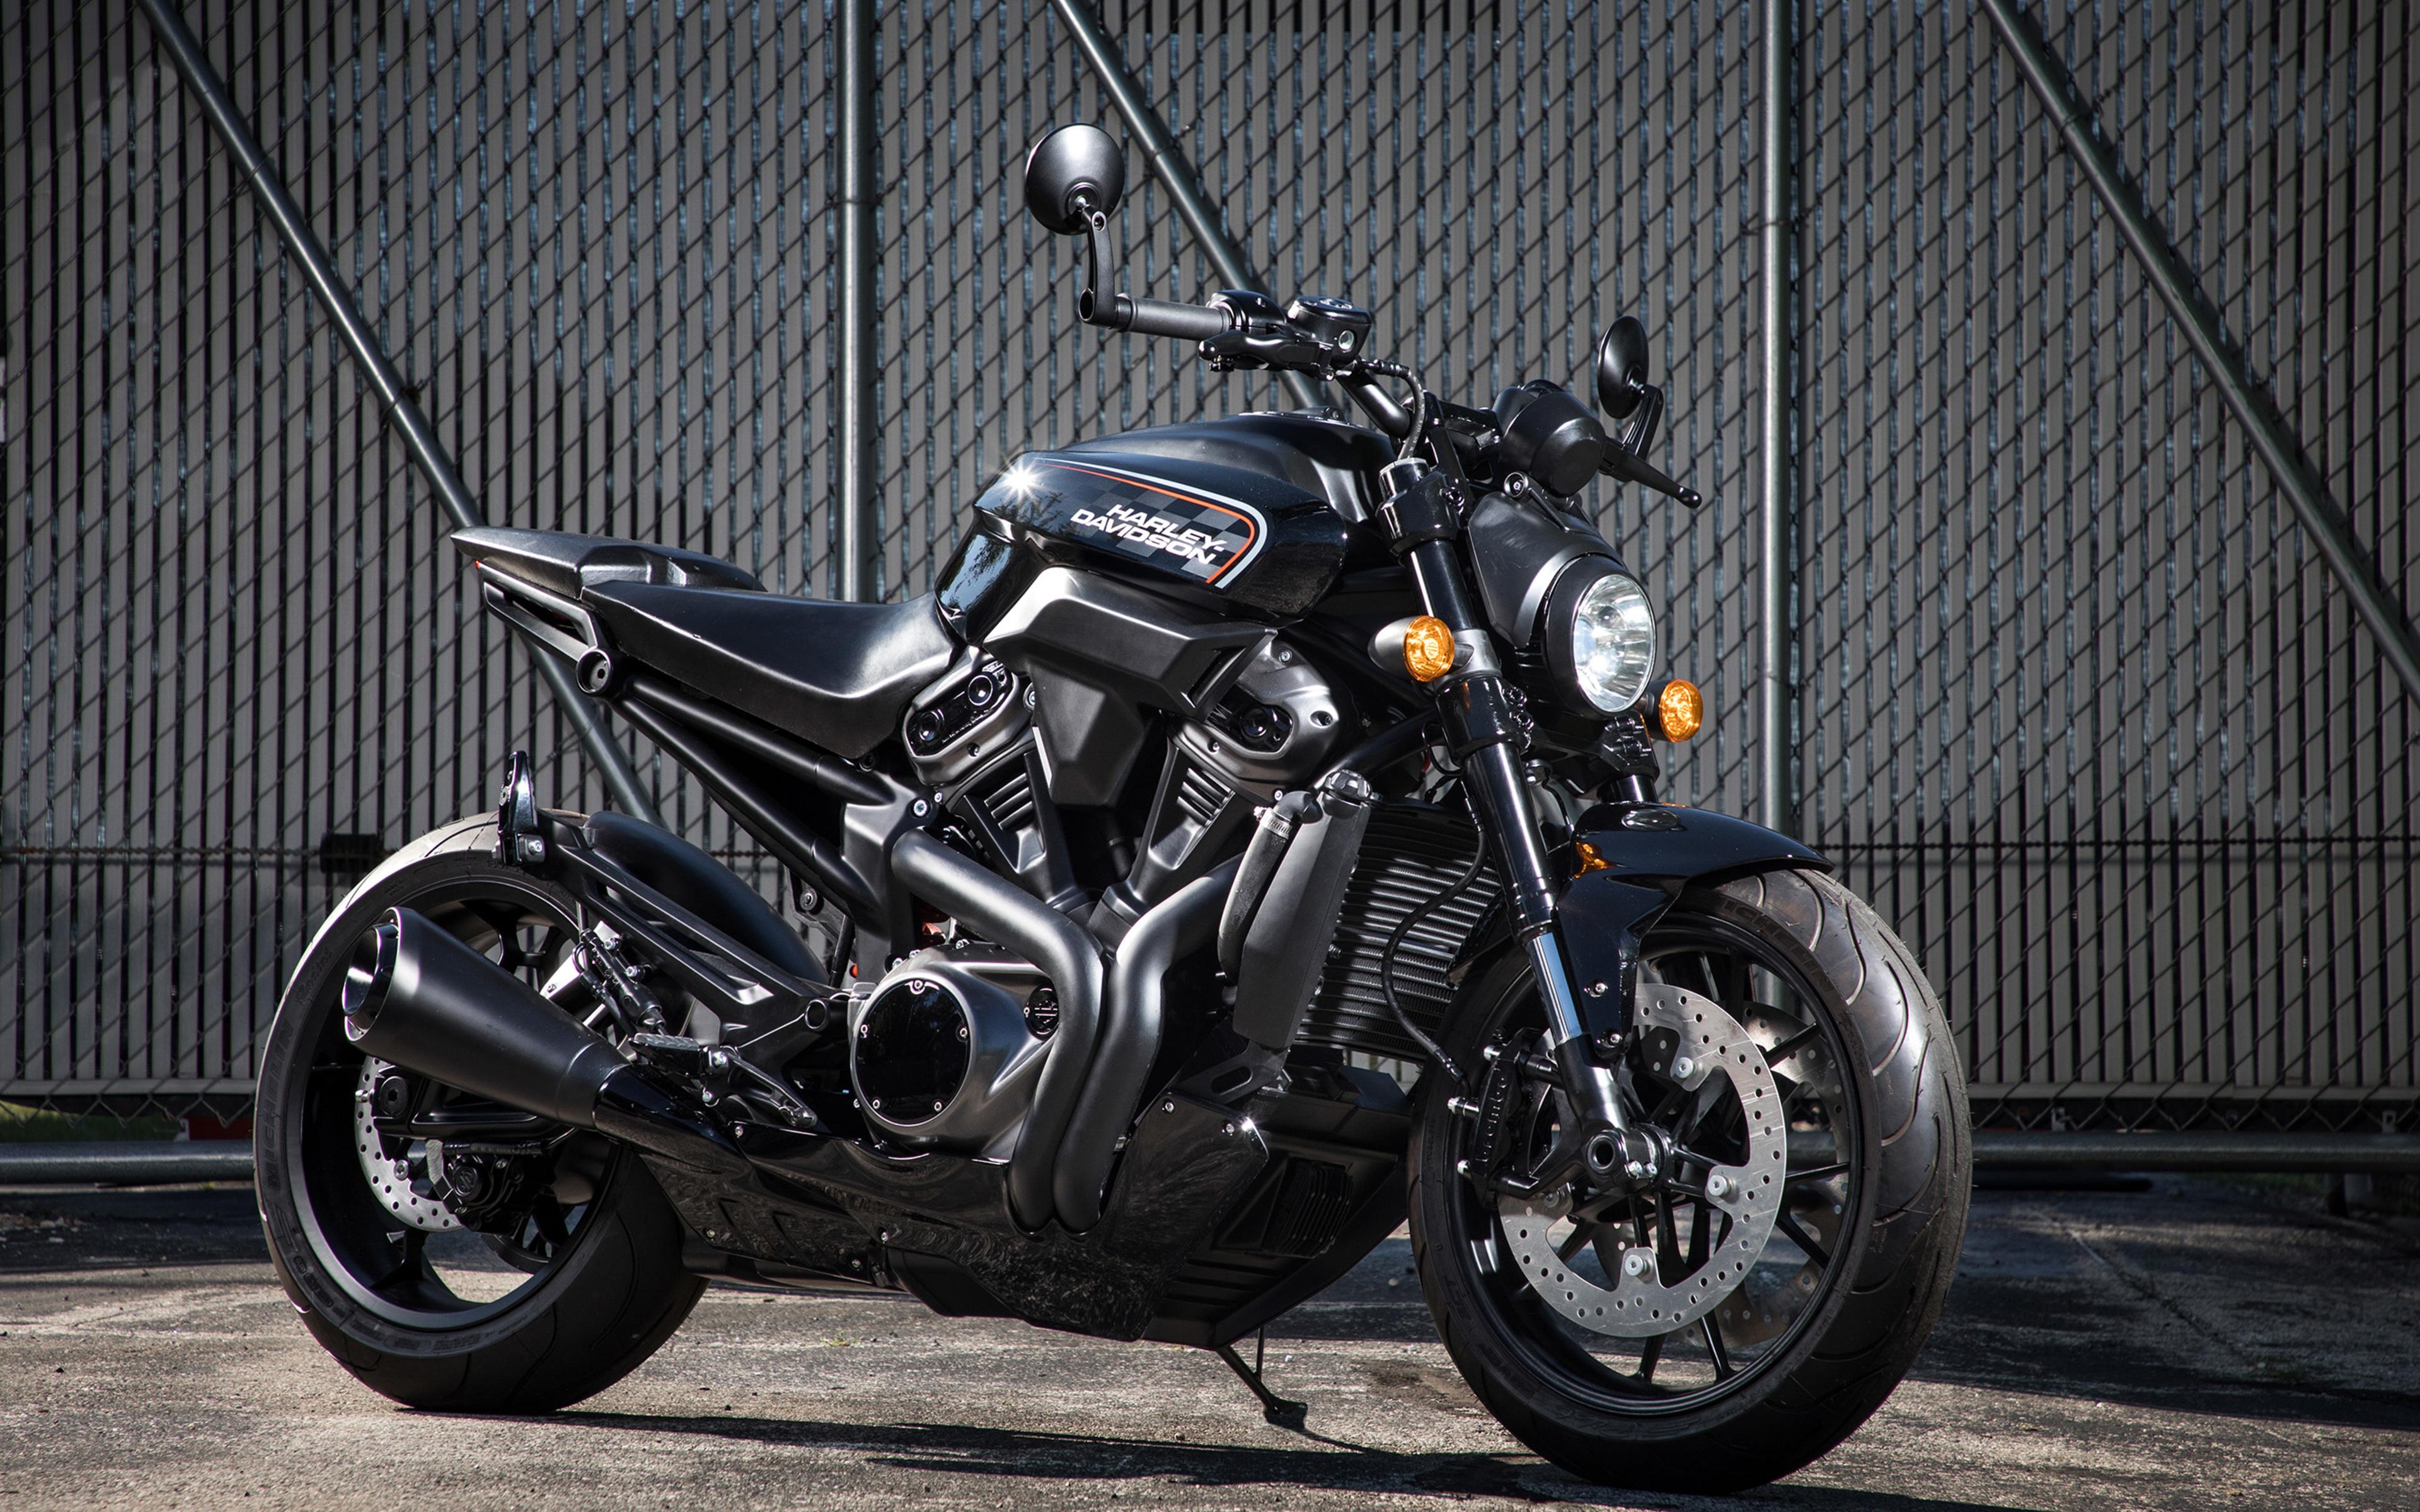 3840x2400 Harley Davidson Streetfighter 2020 4k HD 4k